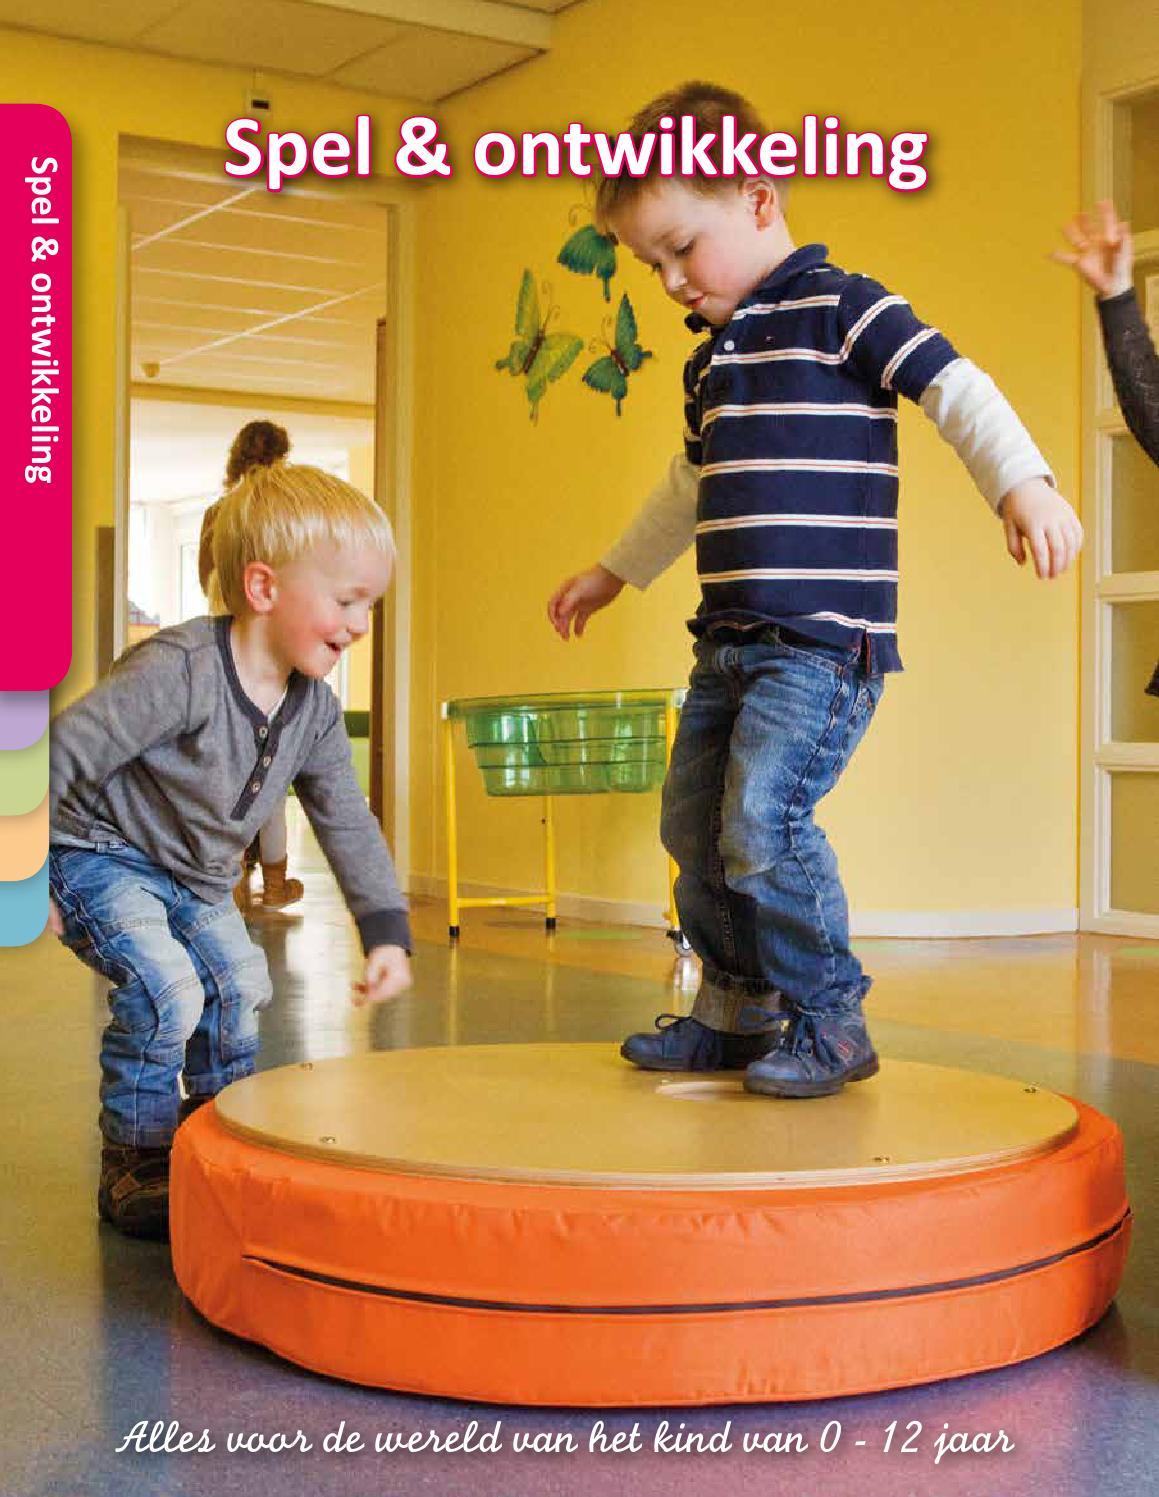 de Rolf groep catalogus kinderopvang - spel & ontwikkeling by de Rolf groep  - issuu